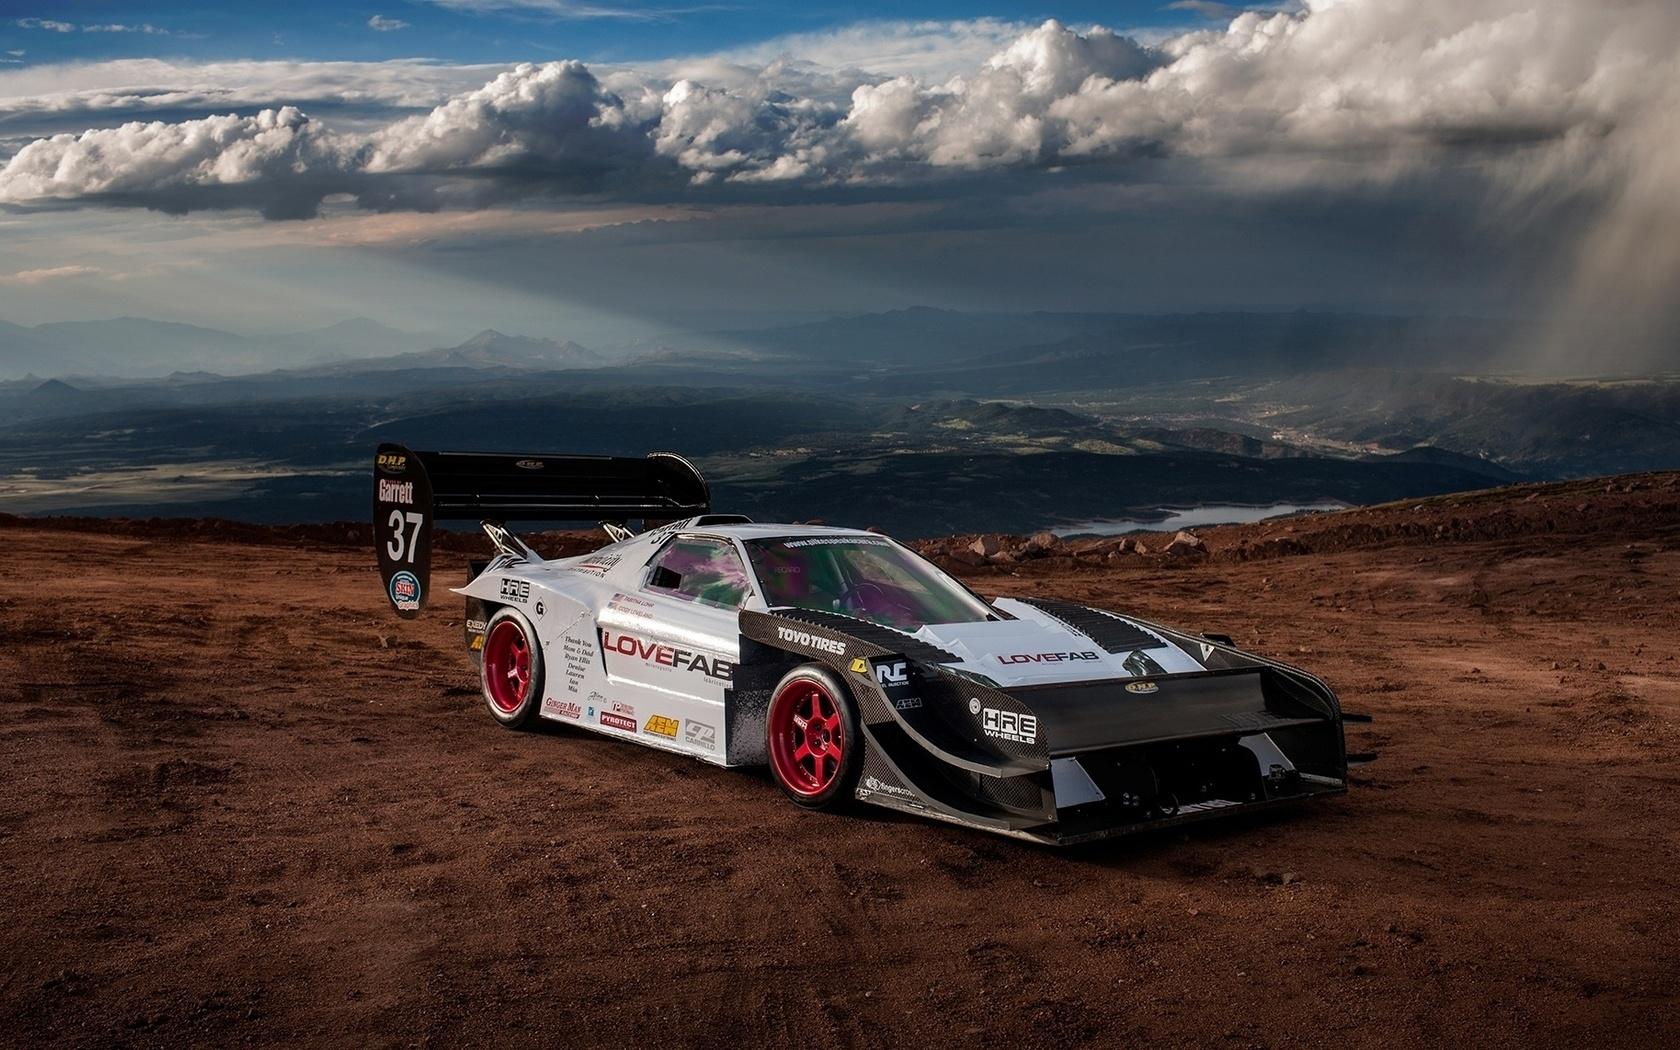 speedhunters, авто, закат, суперкар, япония, ралли, rally, honda, nsx